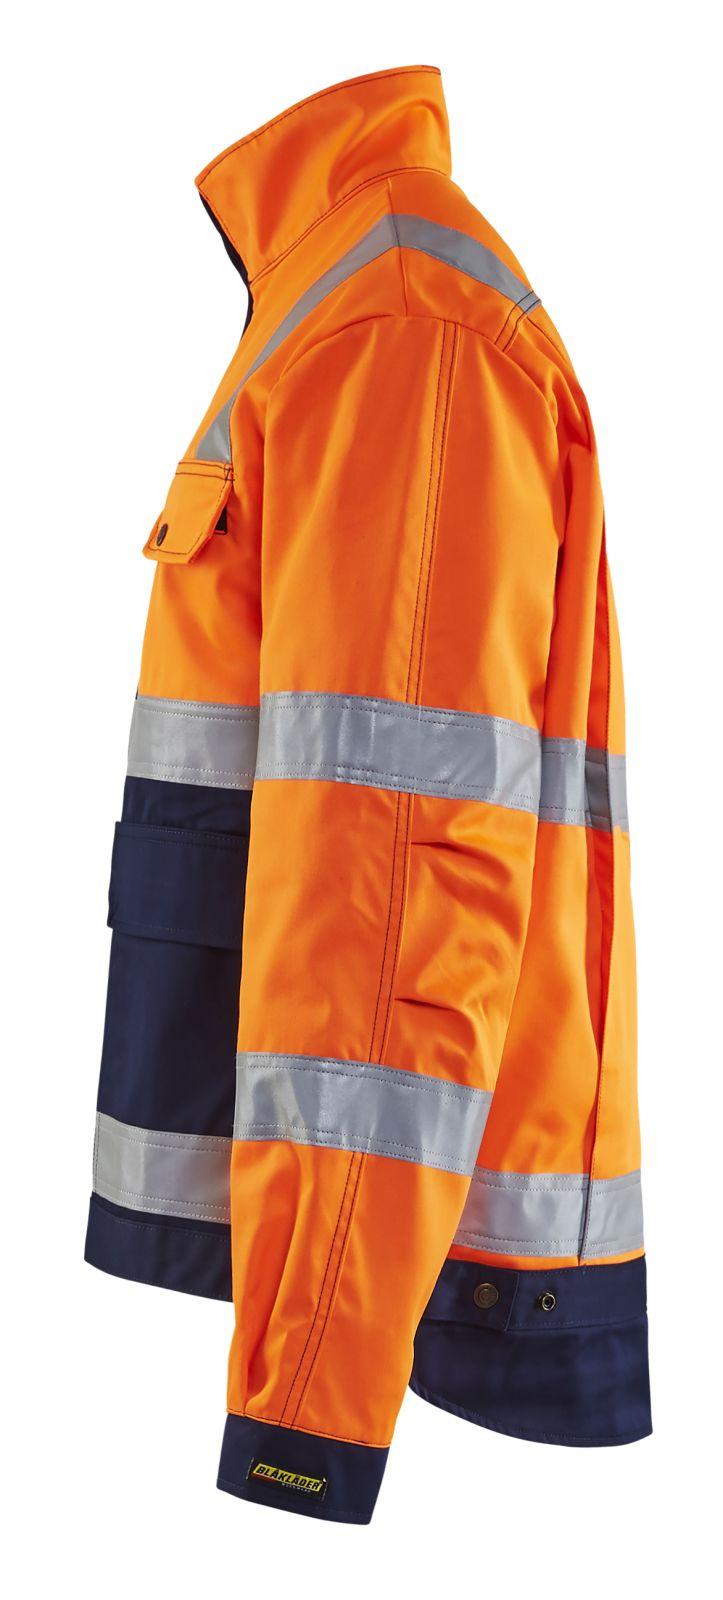 Blaklader Combi-jacks 40231804 High Vis oranje-marineblauw(5389)